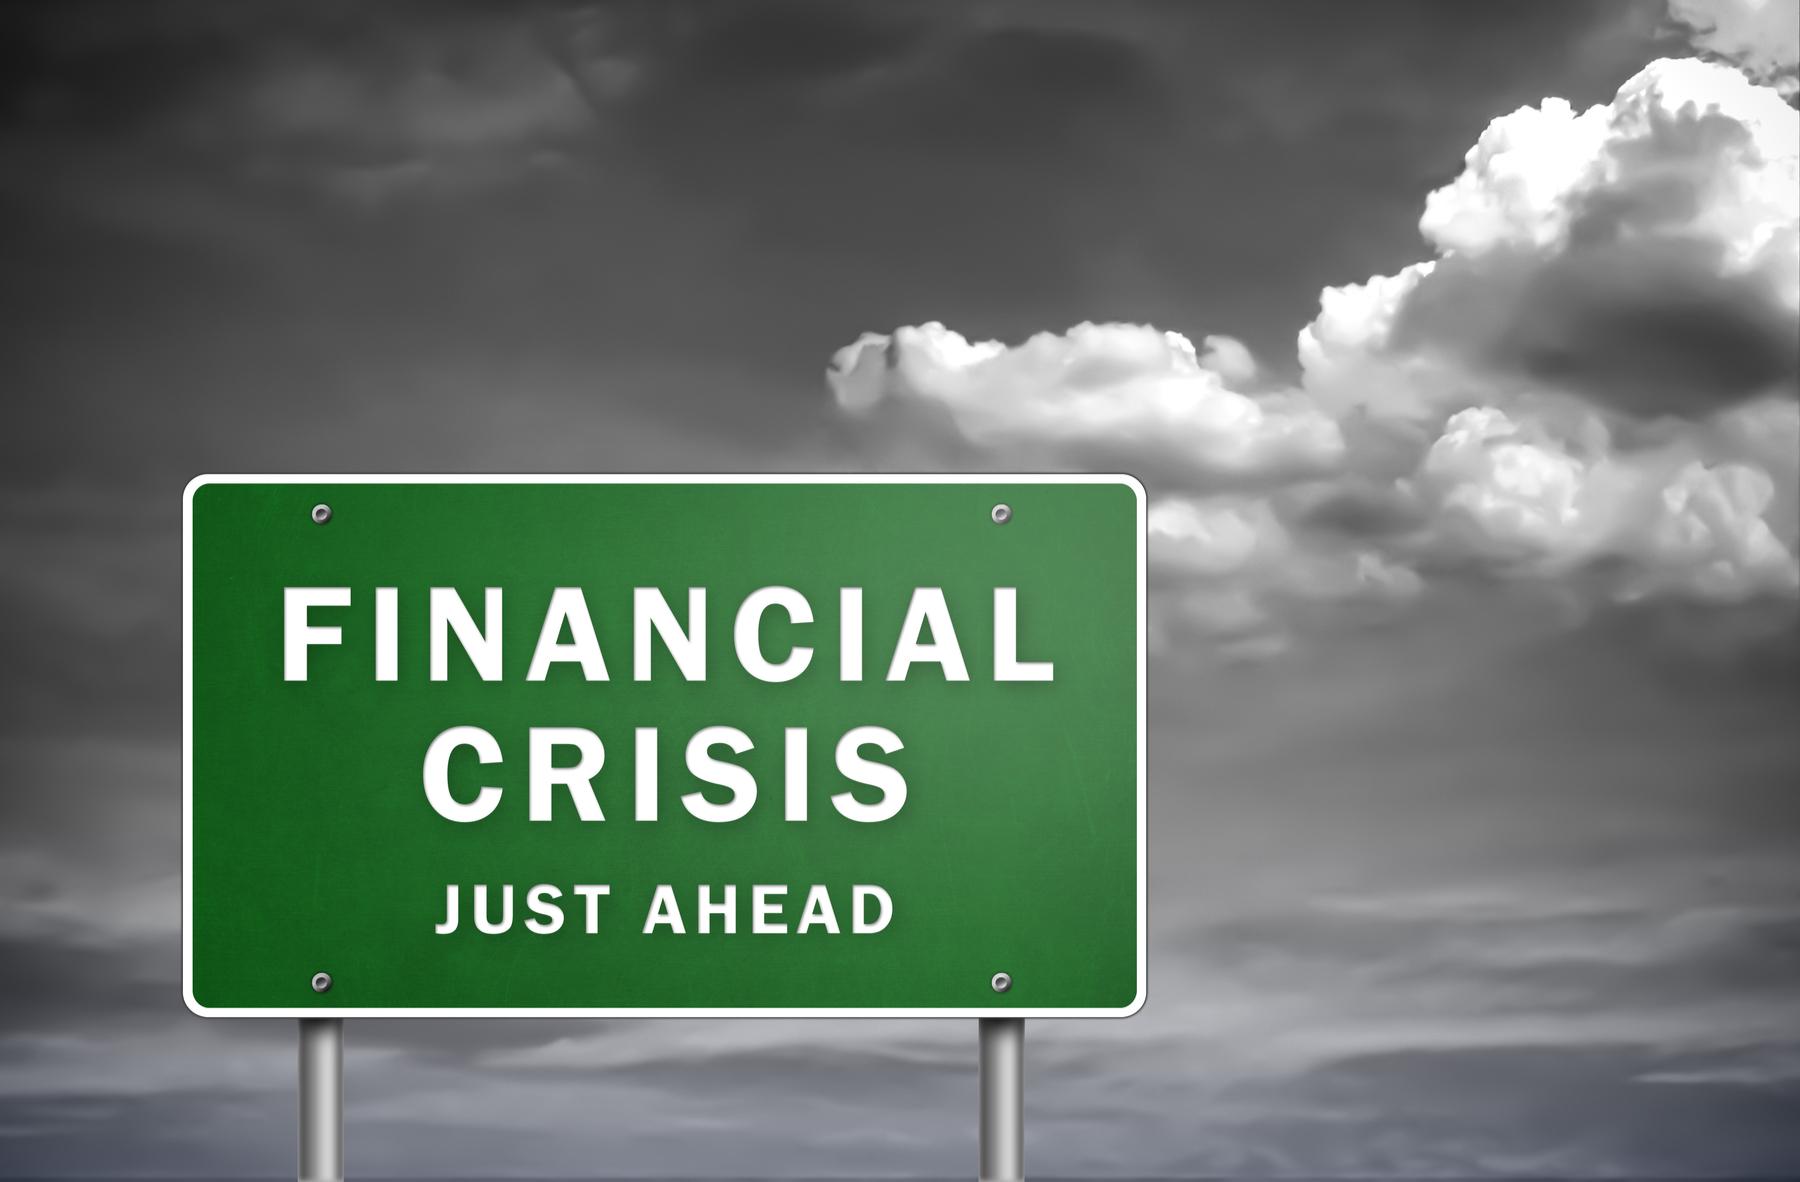 Similarities Between the 2008 Financial Crisis and the Coronavirus Pandemic